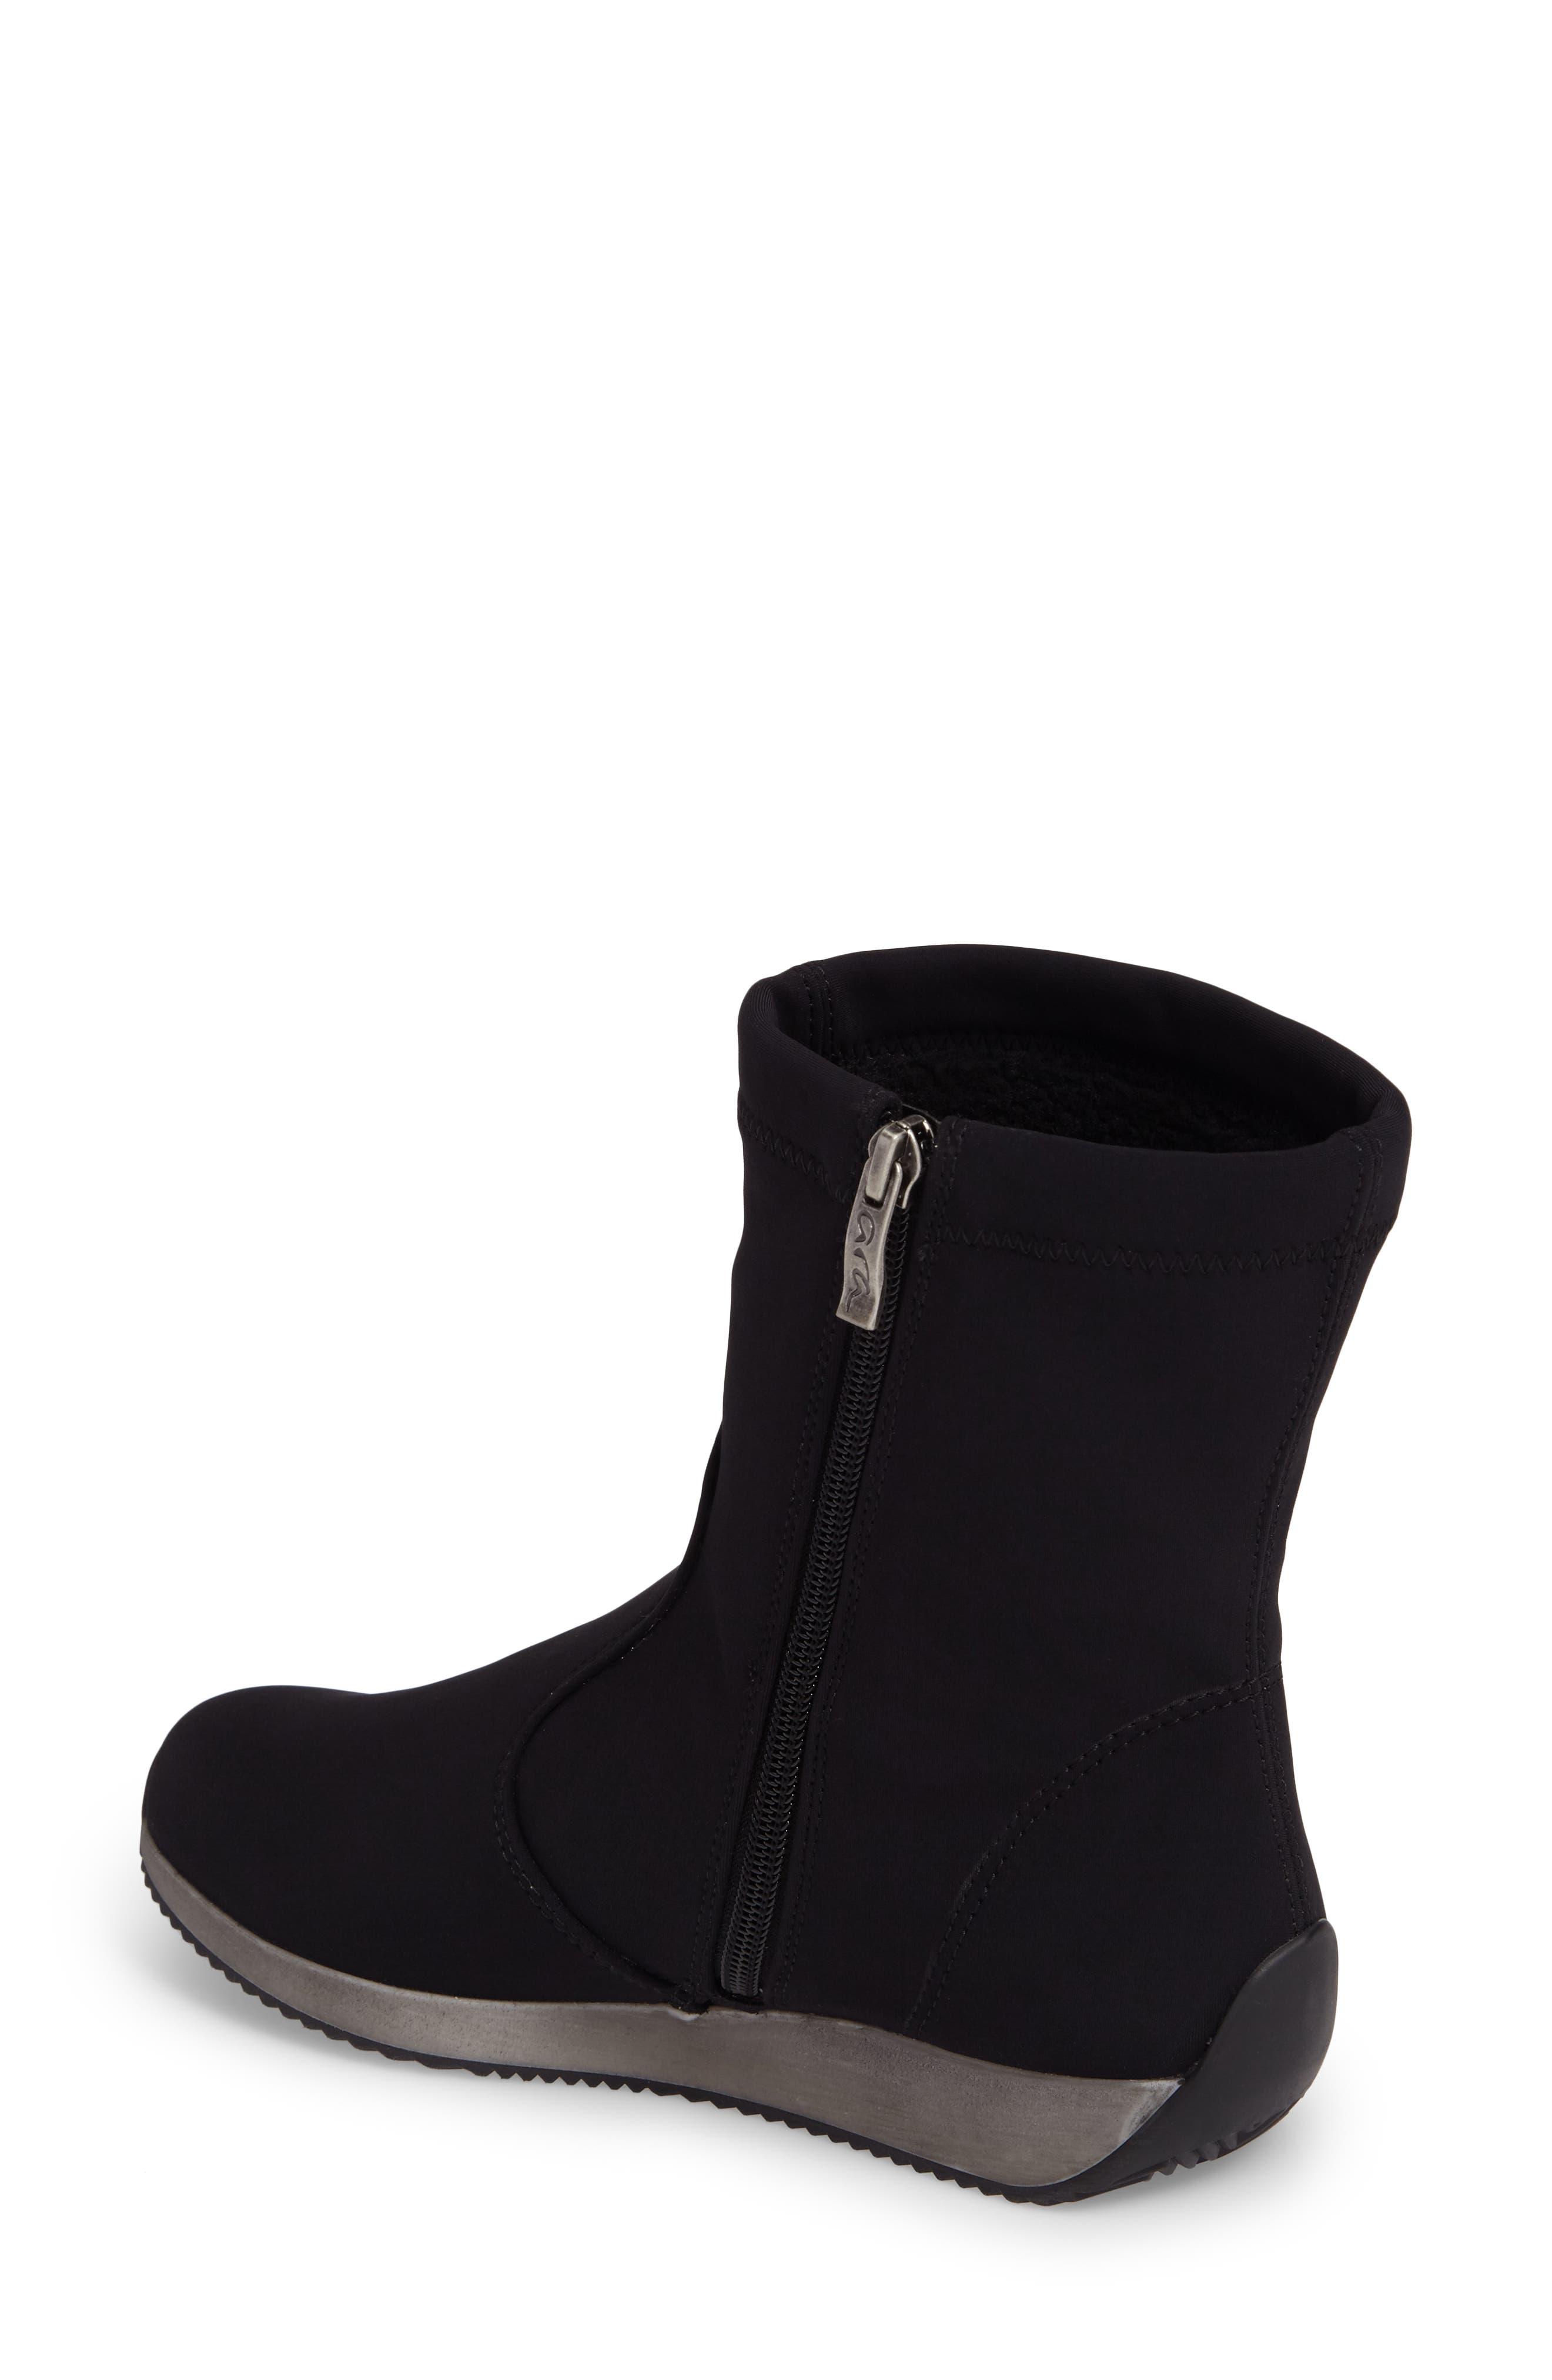 Luella Waterproof Gore-Tex<sup>®</sup> Boot,                             Alternate thumbnail 2, color,                             Black Textile